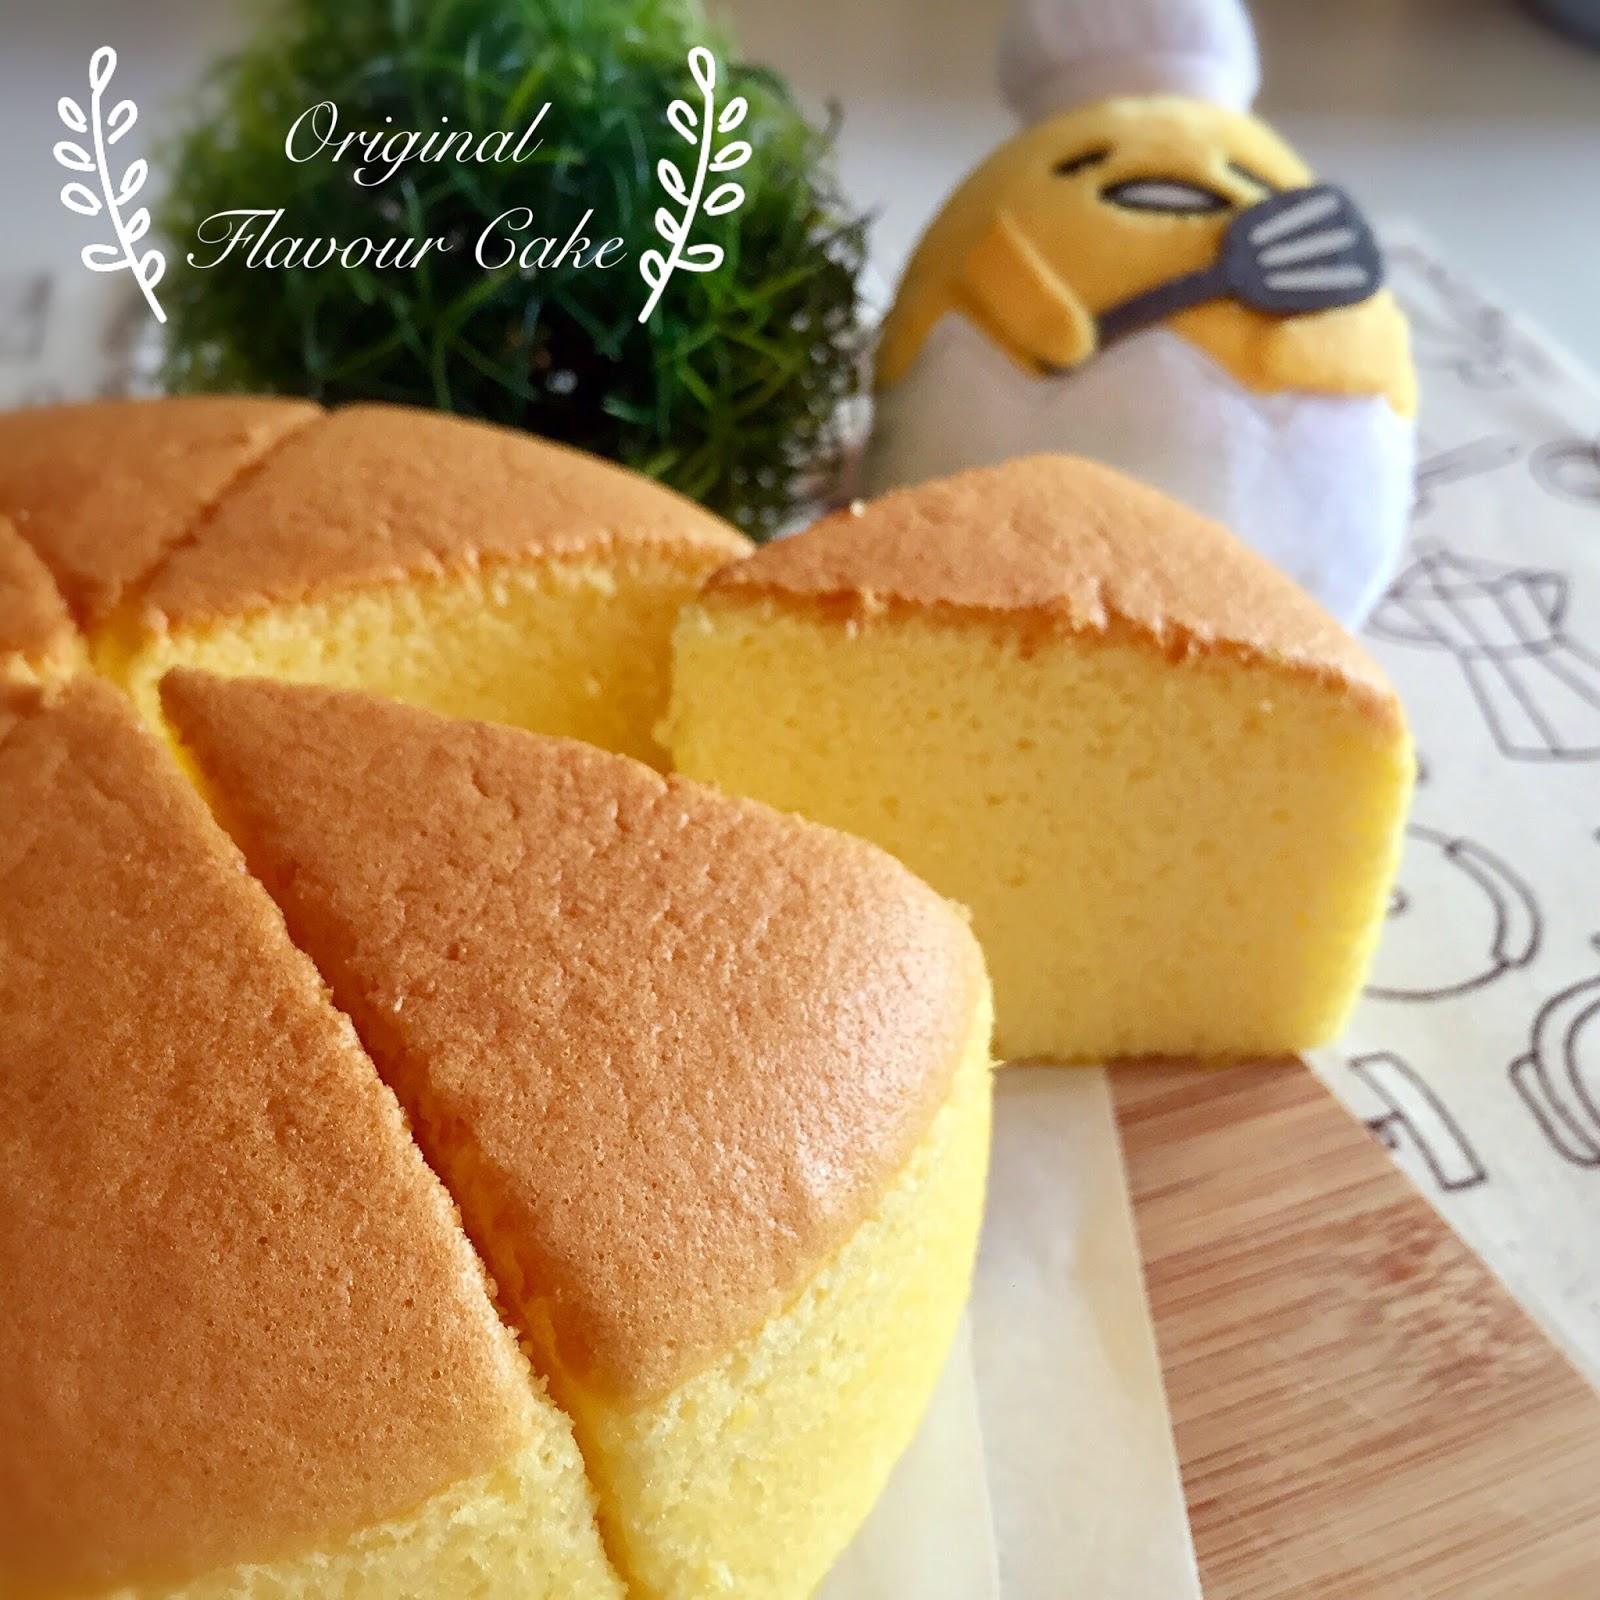 My Mind Patch Original Flavour Cake 烤原味鸡蛋糕